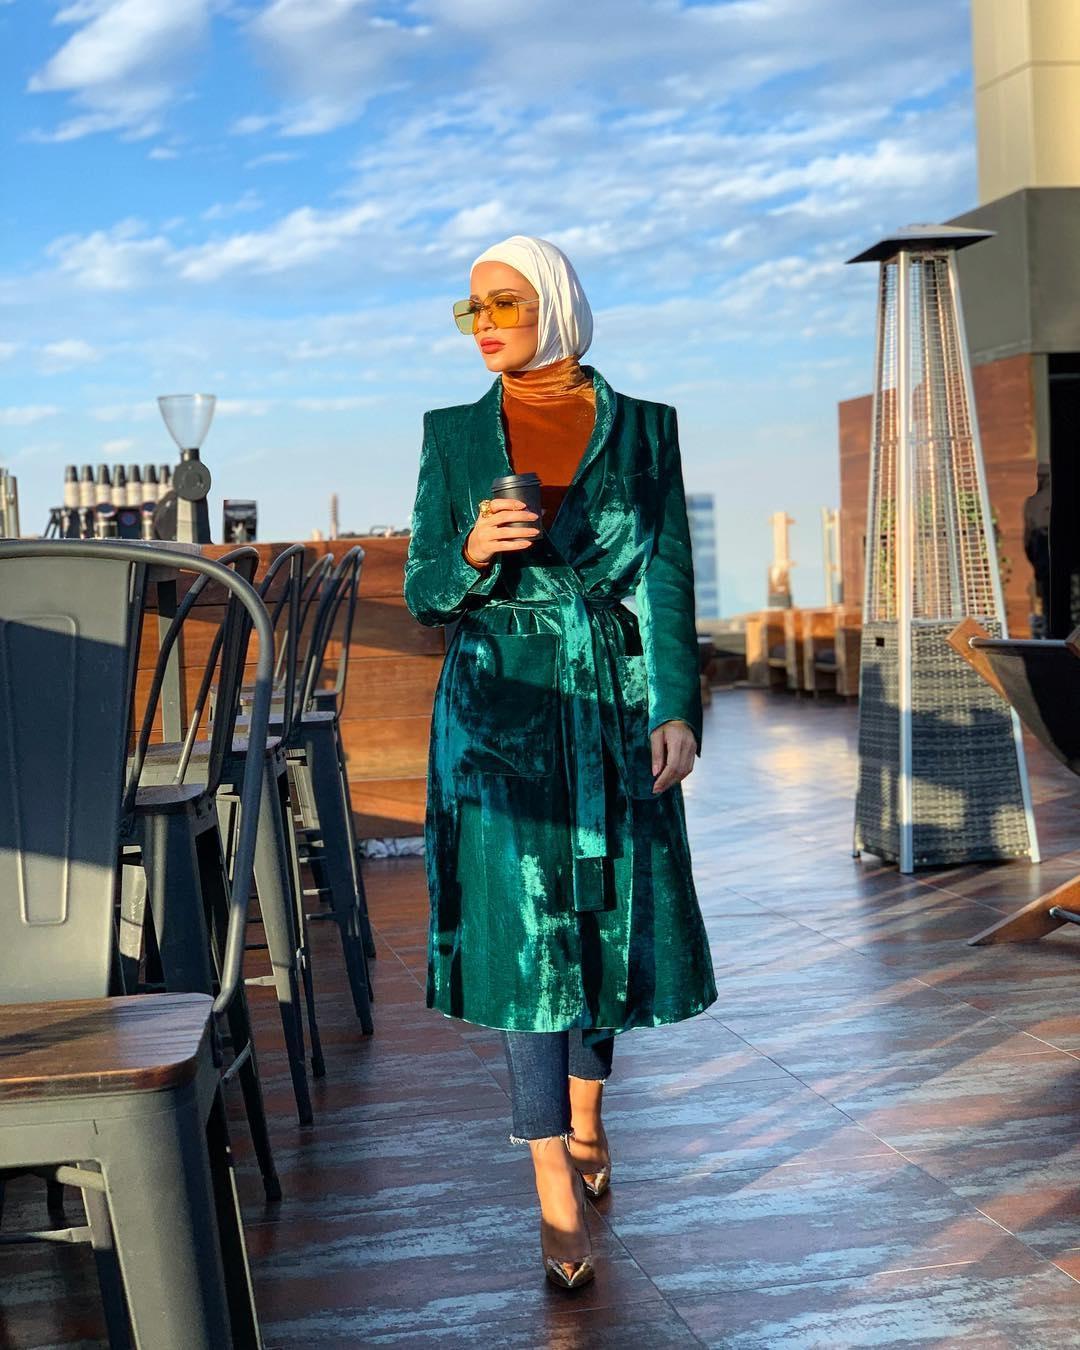 mariam-mohammad-muslimah-fashion-fashionable-muslim-women